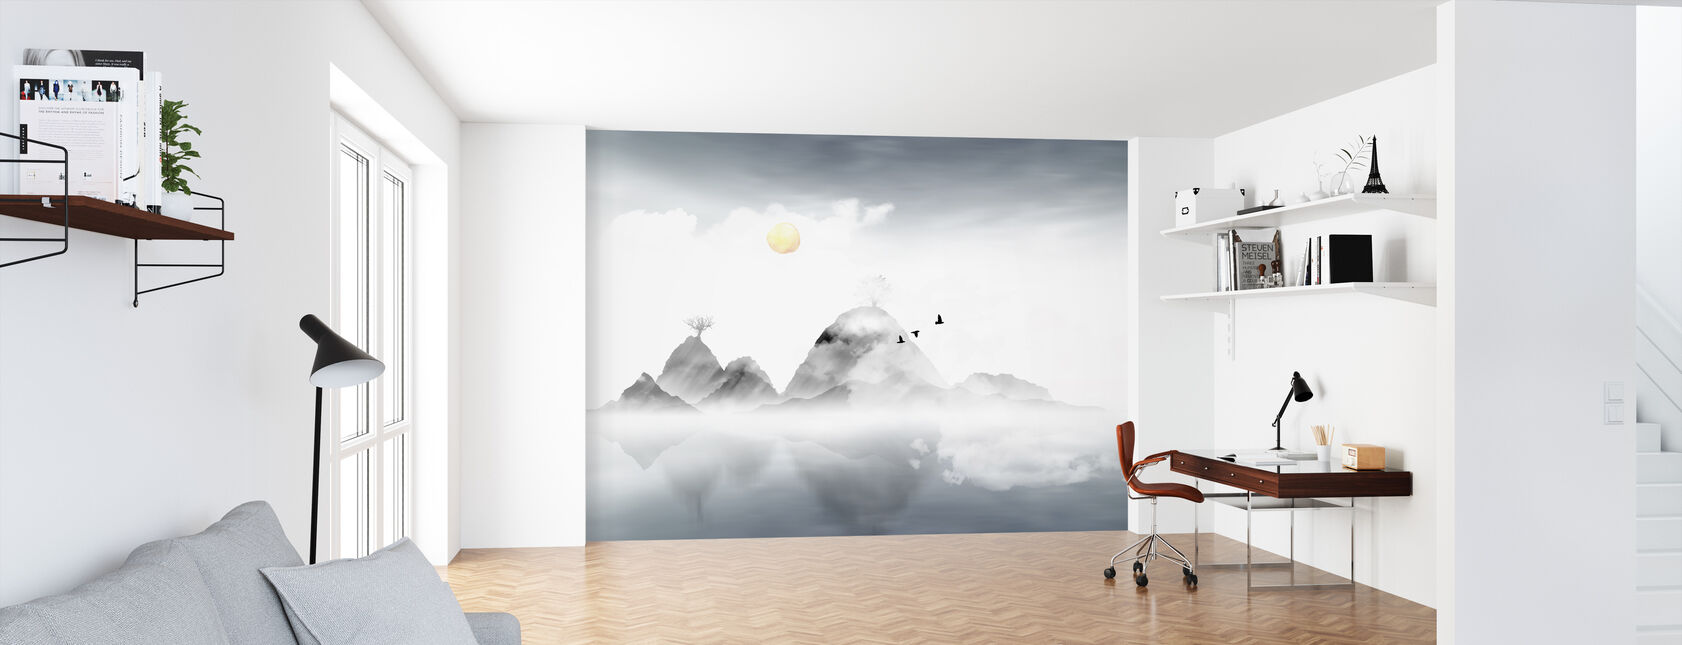 Dreamland - Wallpaper - Office